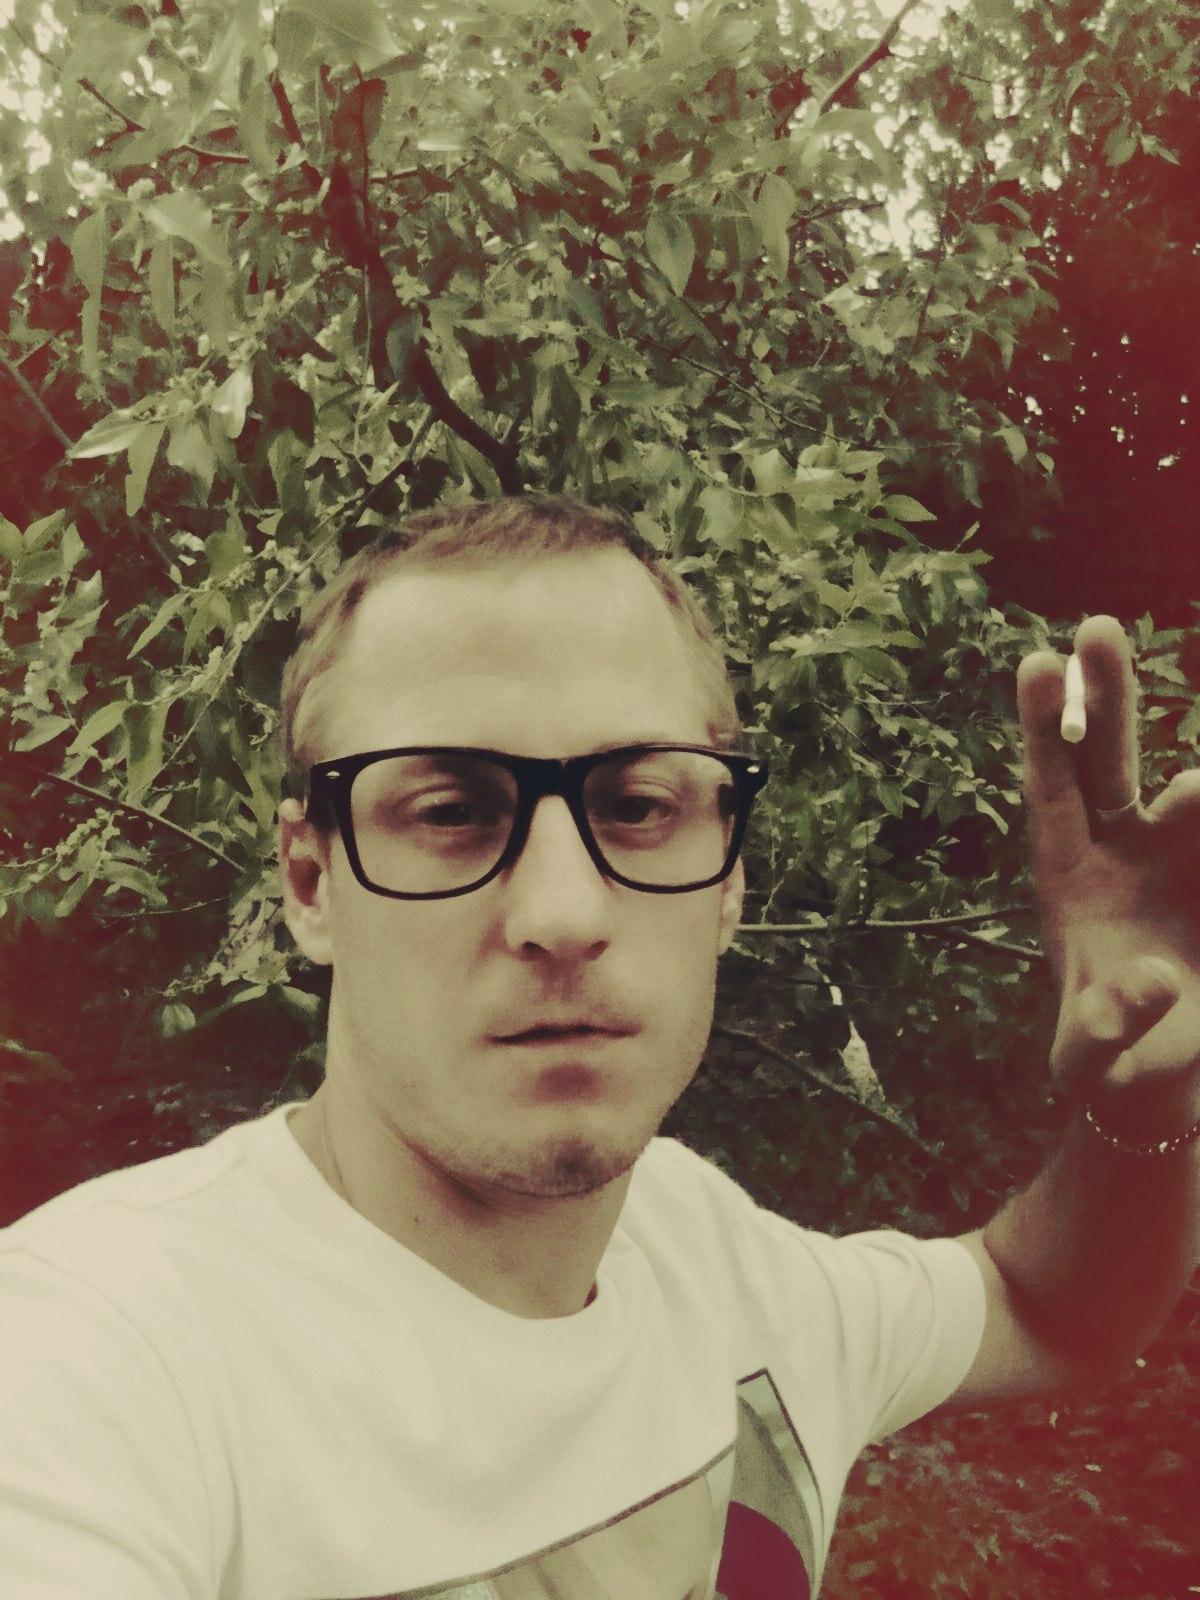 Фото парней в очках (23 фото) - =_Николай_=, Краснодар